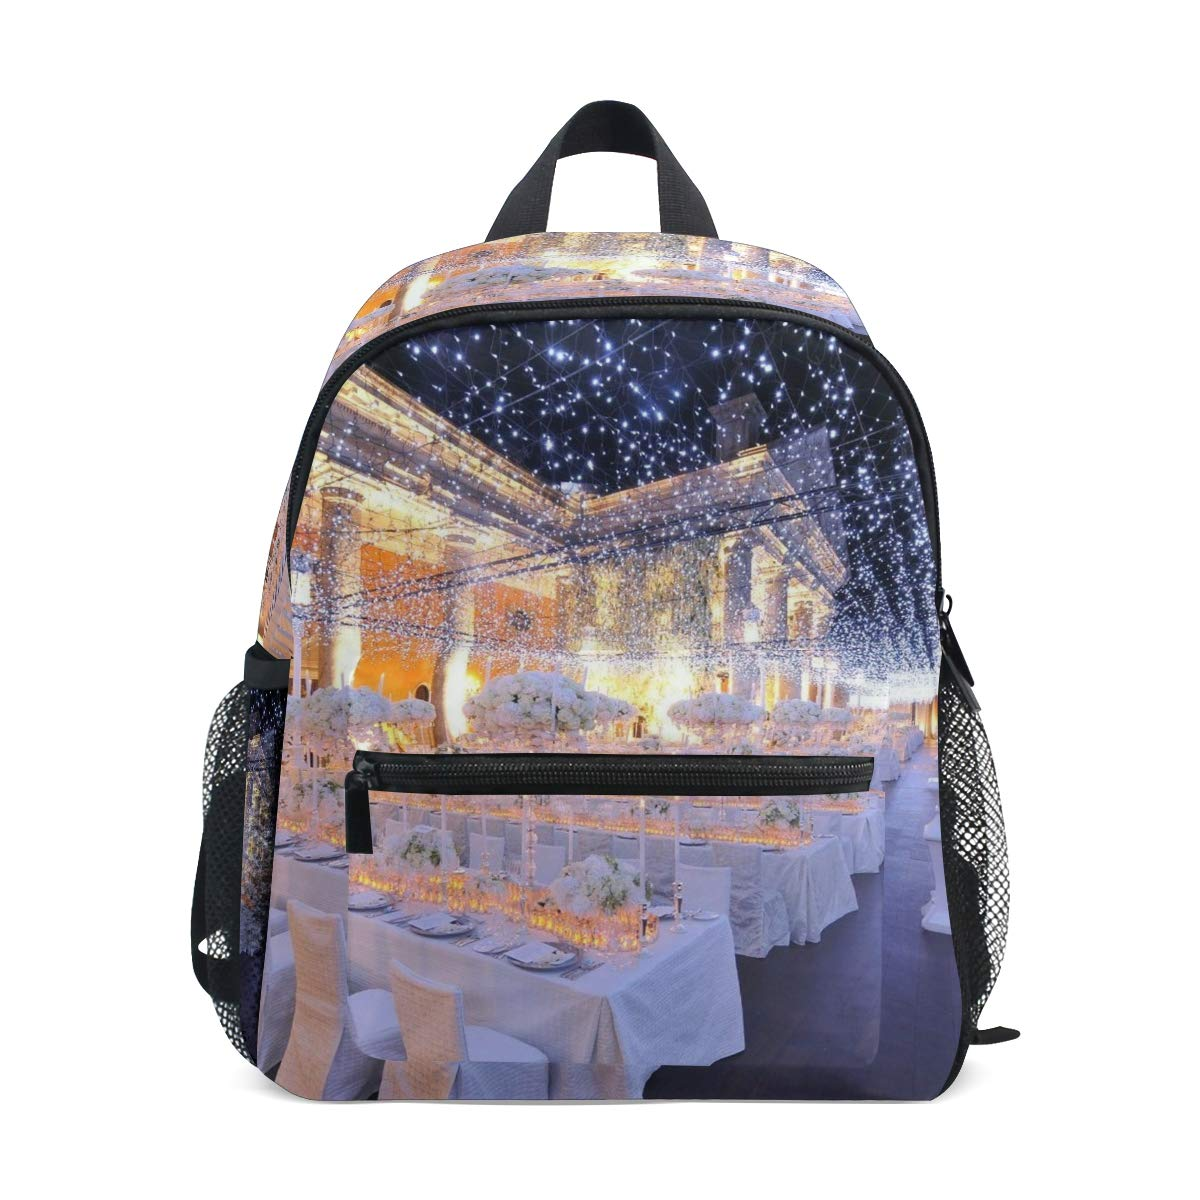 Funny PrintStarry Wedding Lightweight School Backpack for Boys Girl Kids